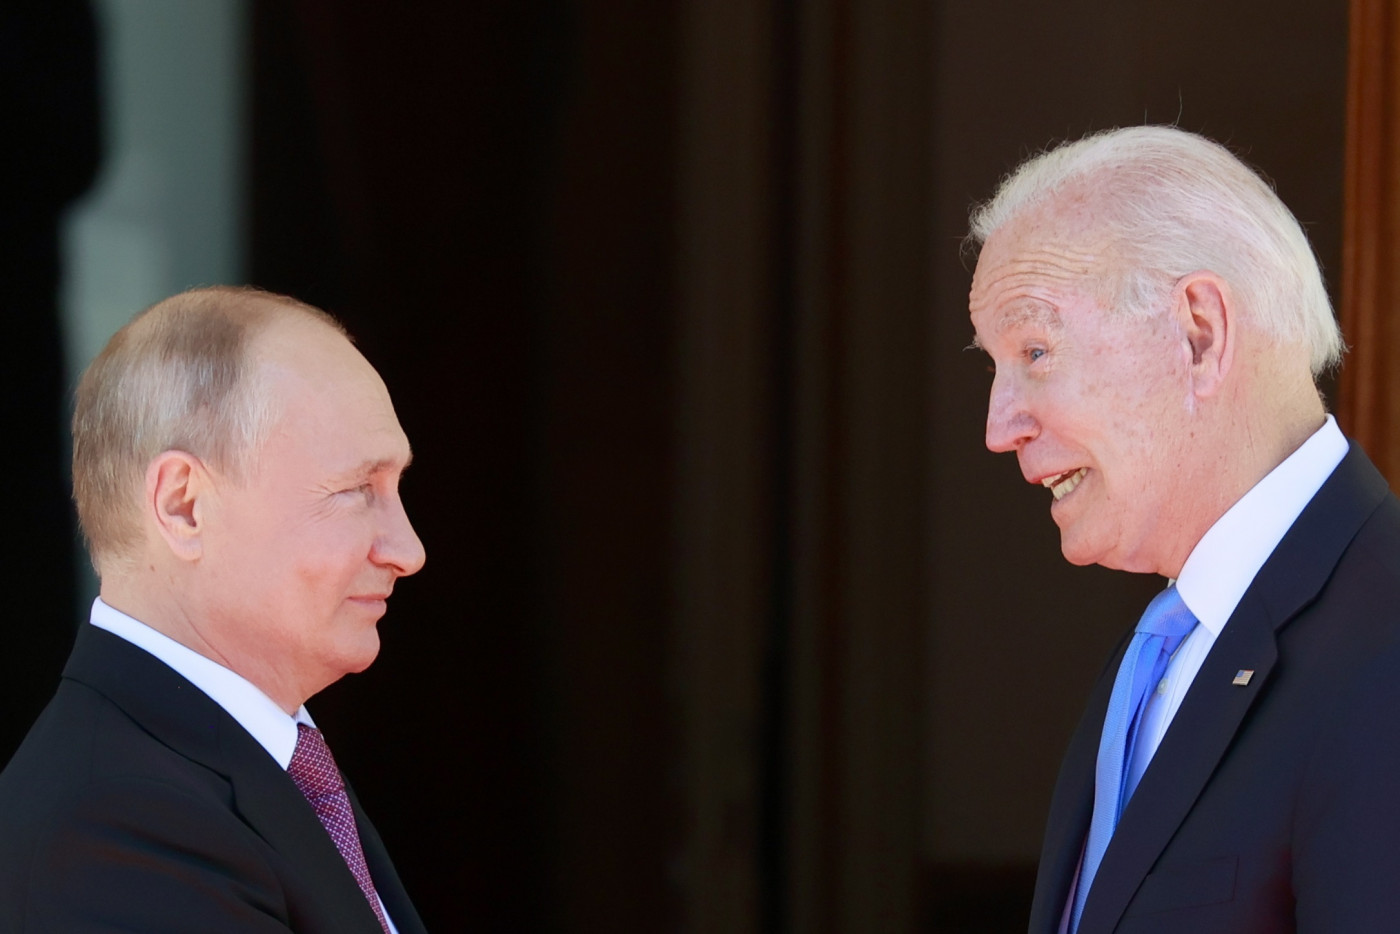 O presidente dos Estados Unidos, Joe Biden, se reúne com Vladimir Putin